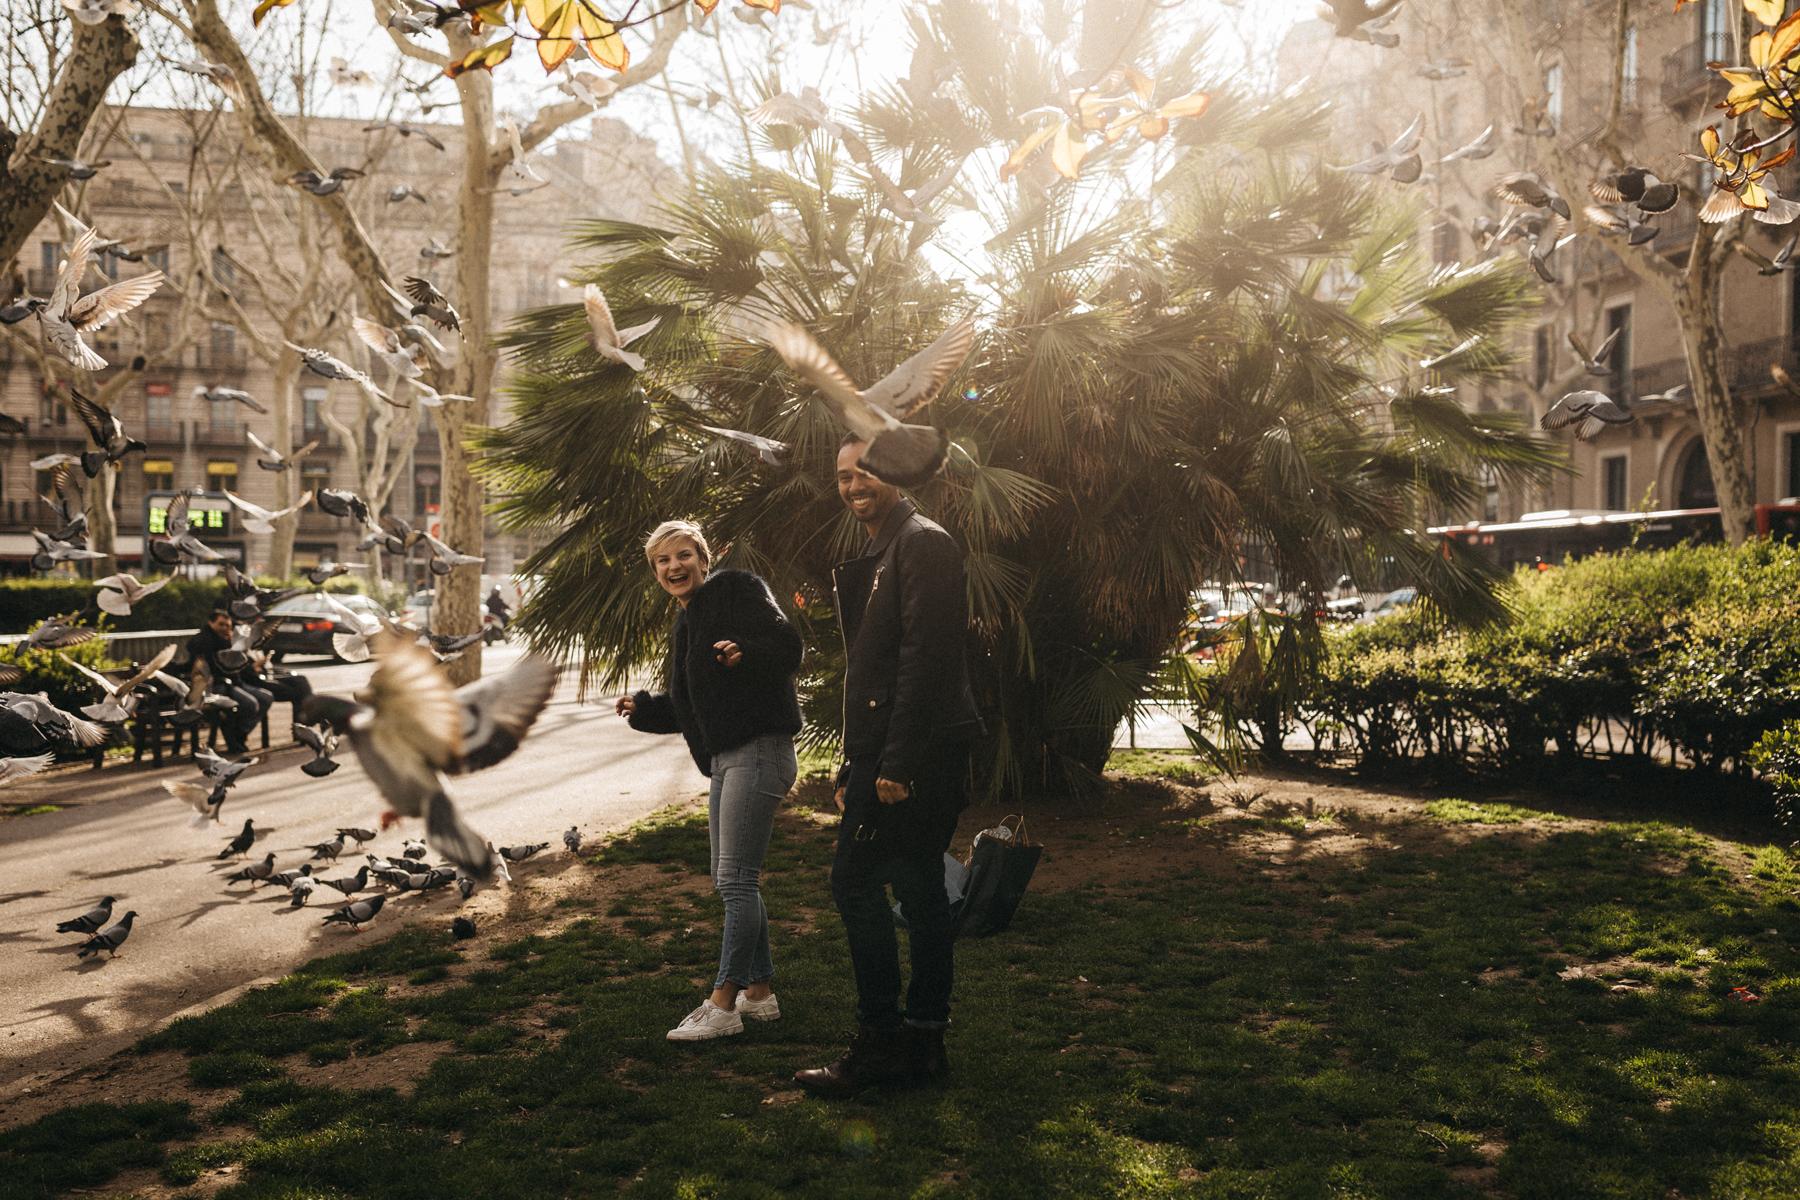 raissa simon fotografie urban coupleshooting barcelona 032 - Wietske + Stefanos